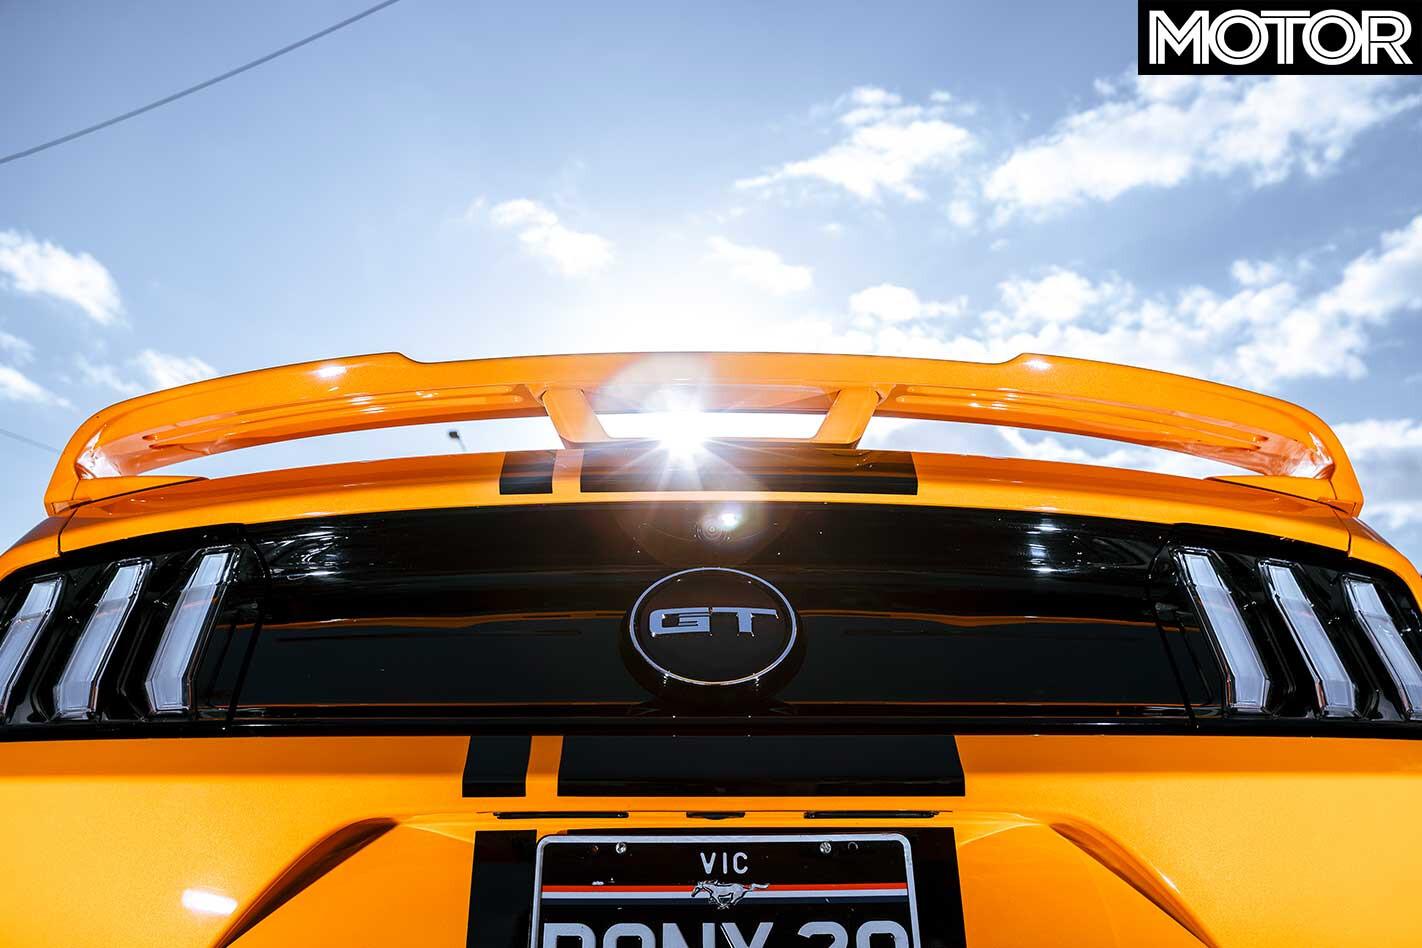 2018 Ford Mustang GT Rear Wing Badge Jpg